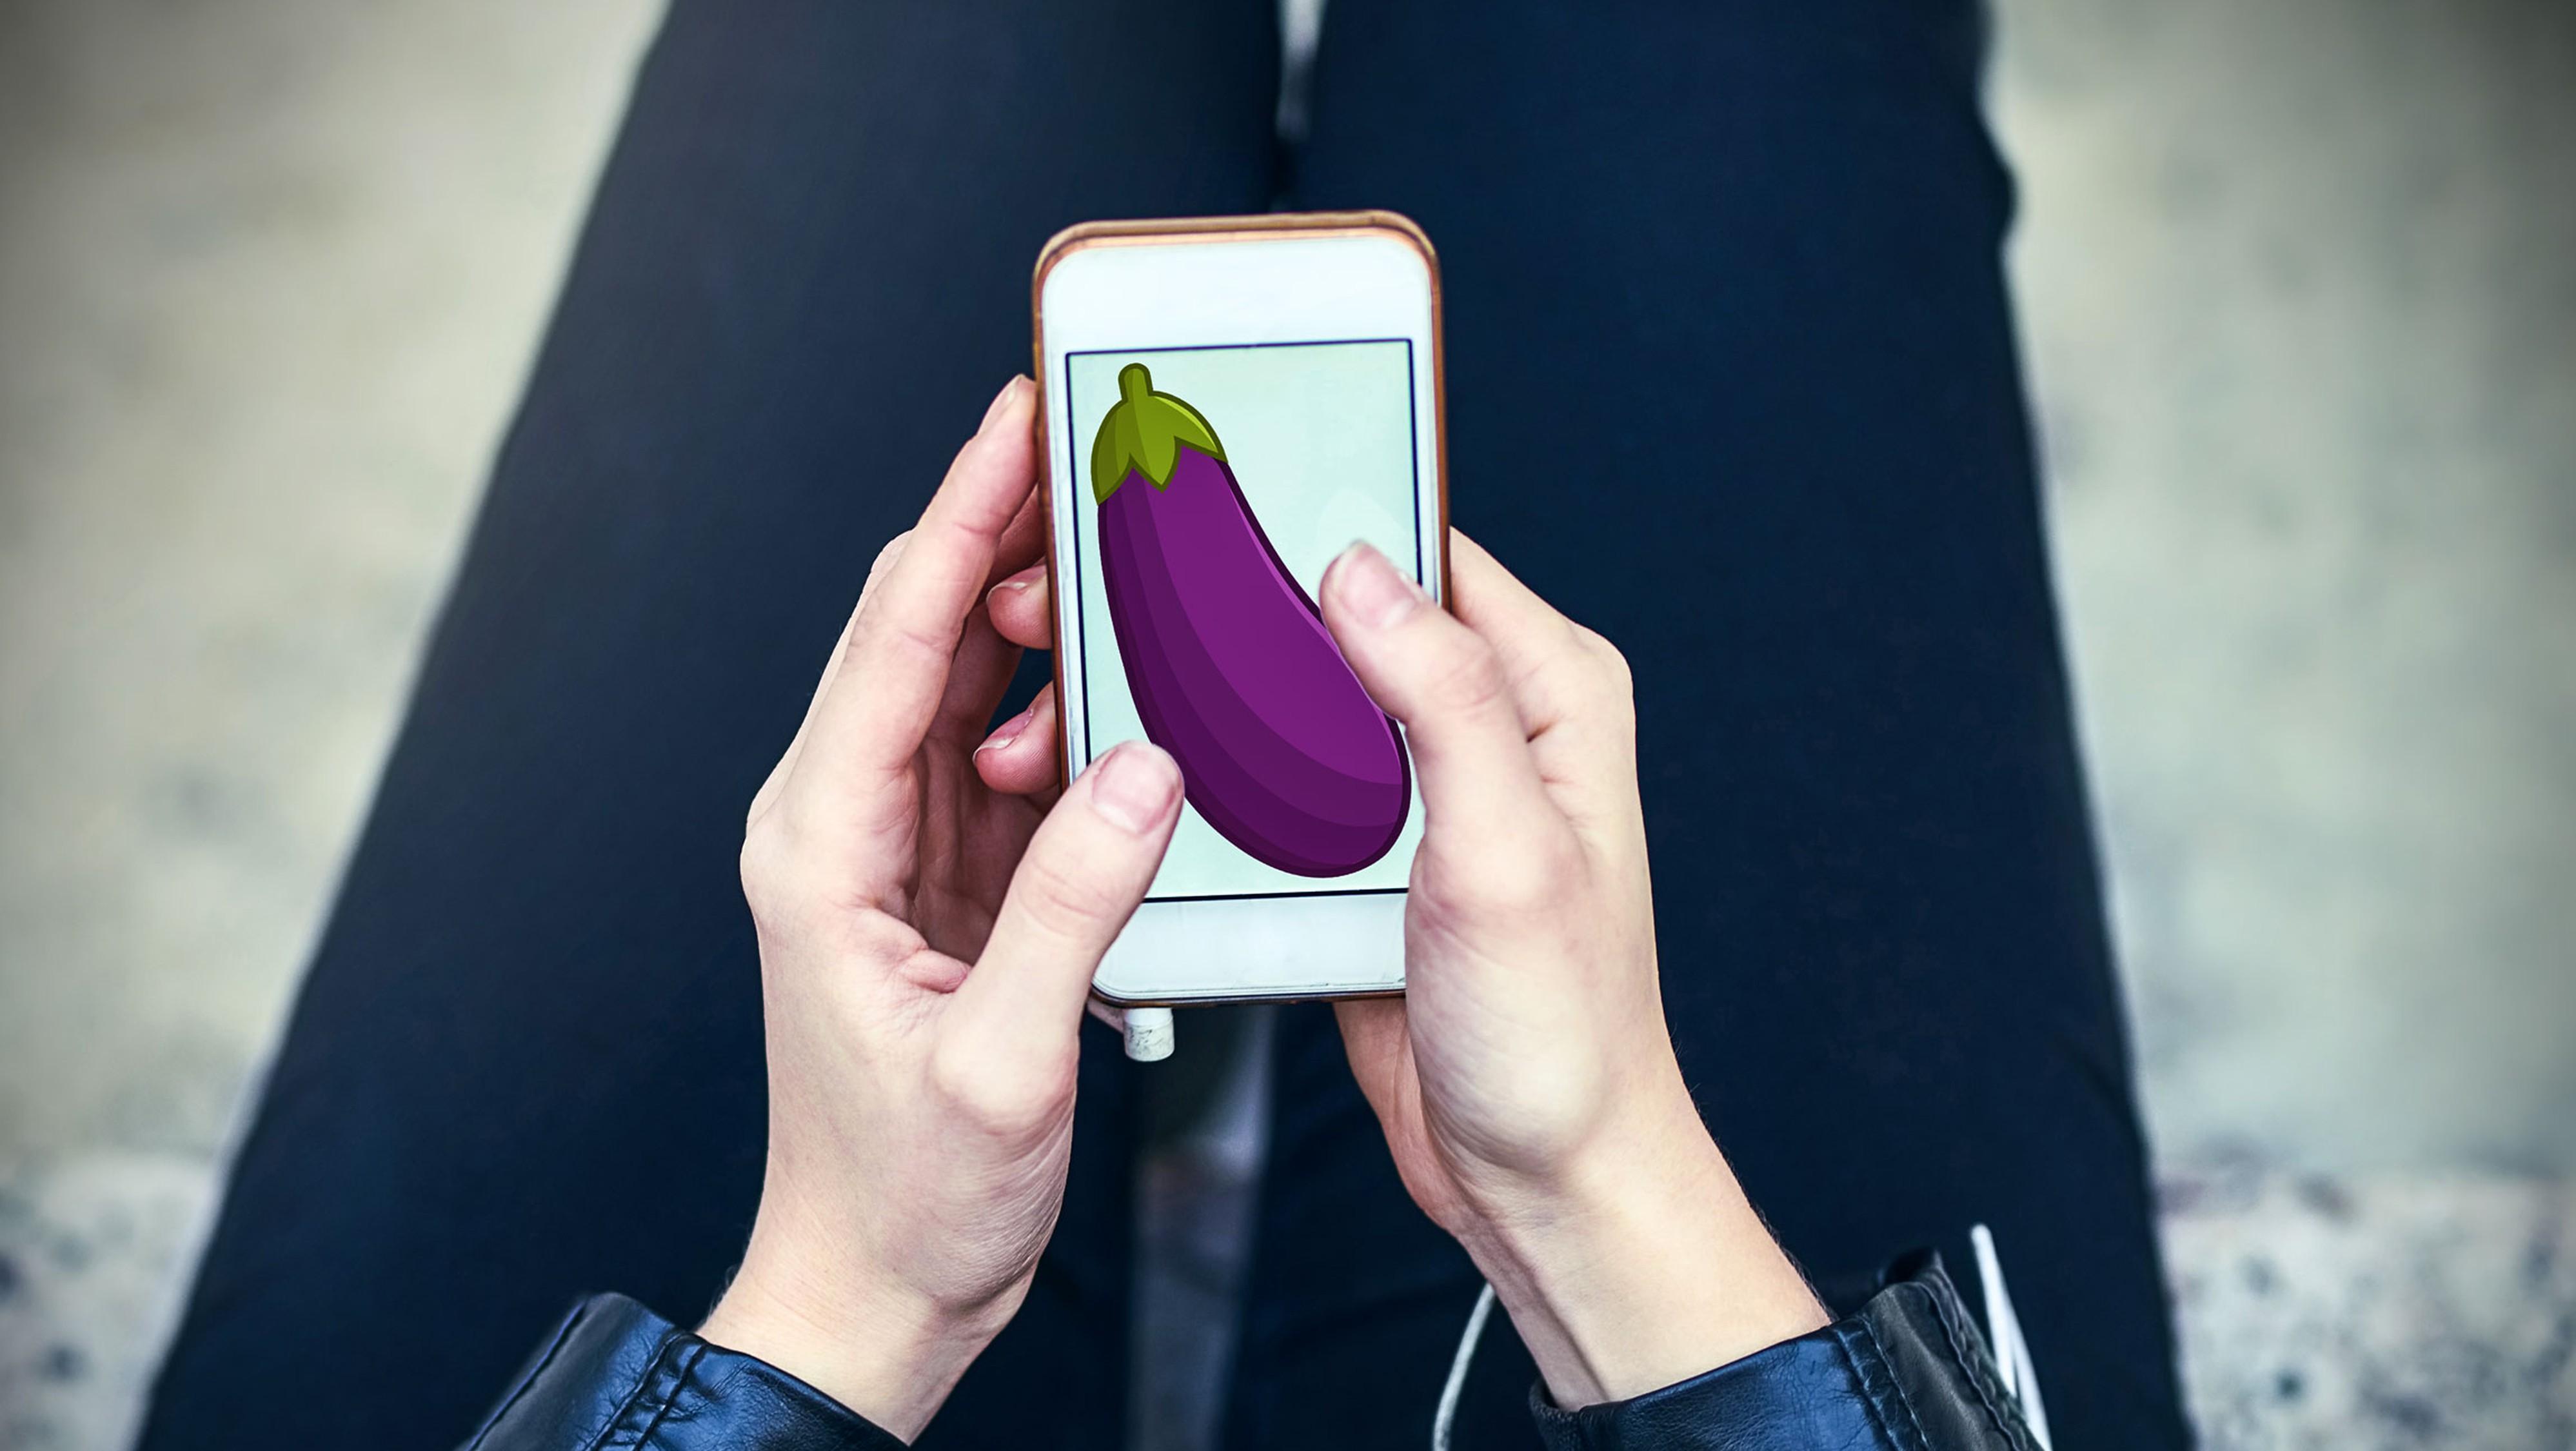 Porno Für Android